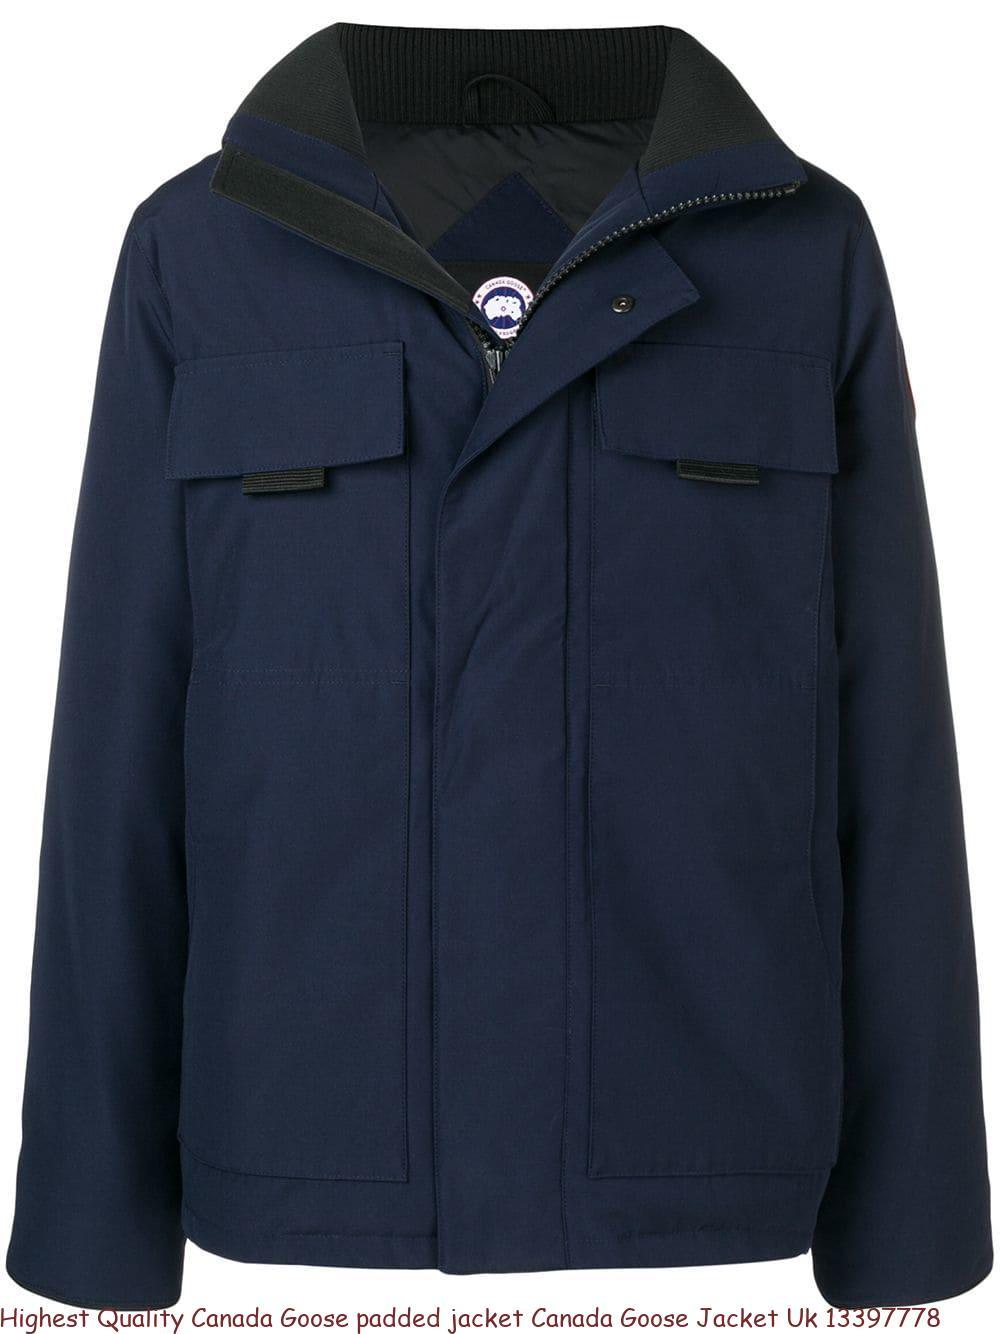 Quality 13397778 Highest Canada Goose Uk Padded Jacket vm8wn0N